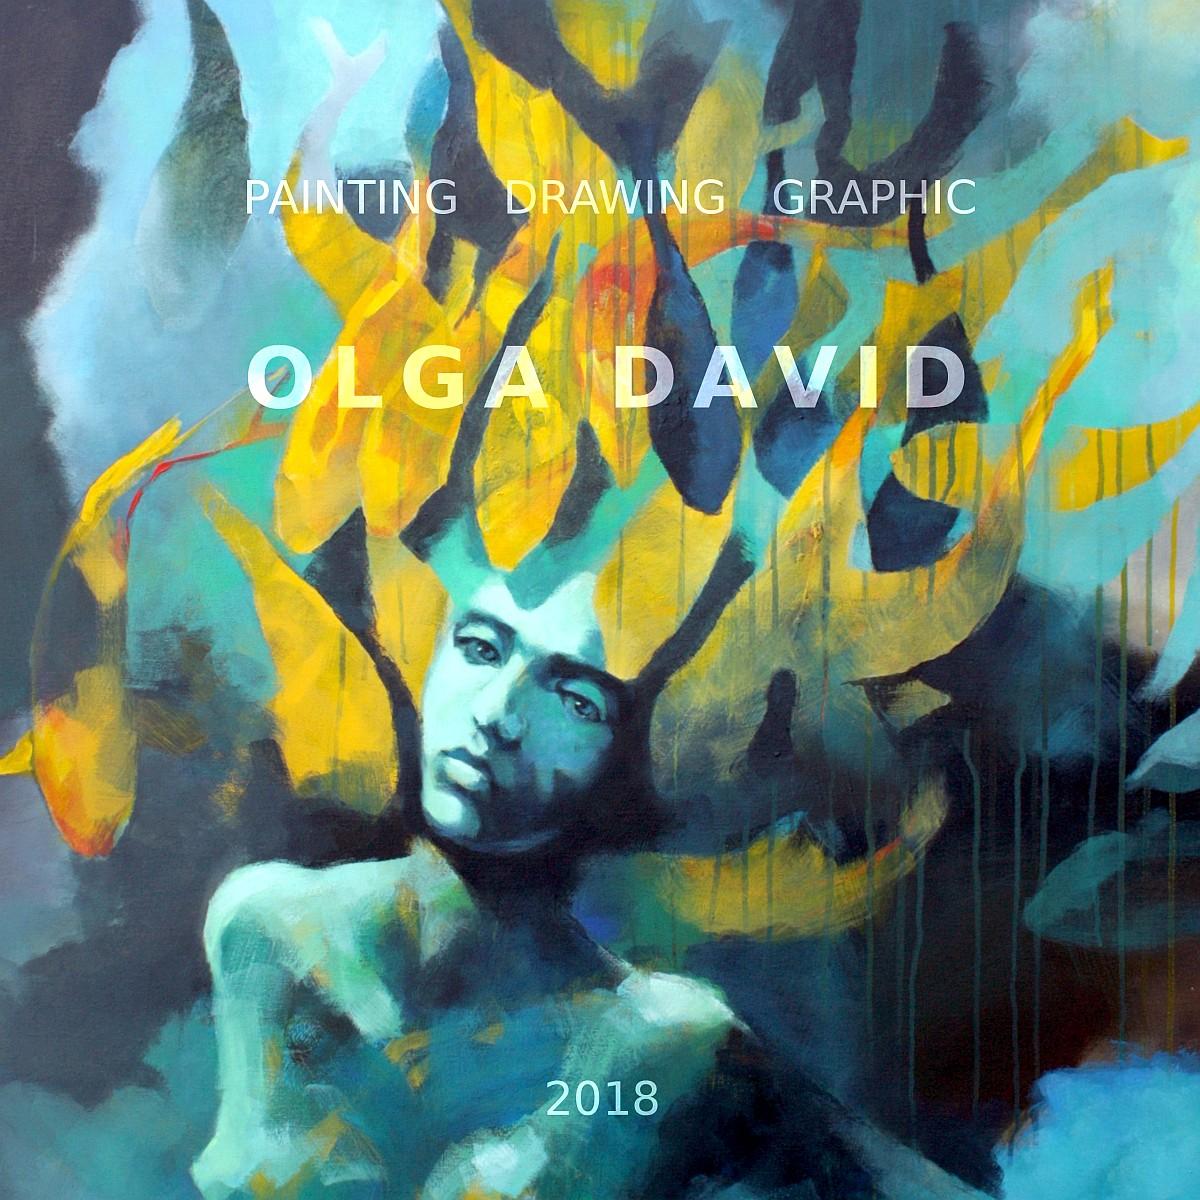 Katalog Olga David Painting Drawing Graphic 2018